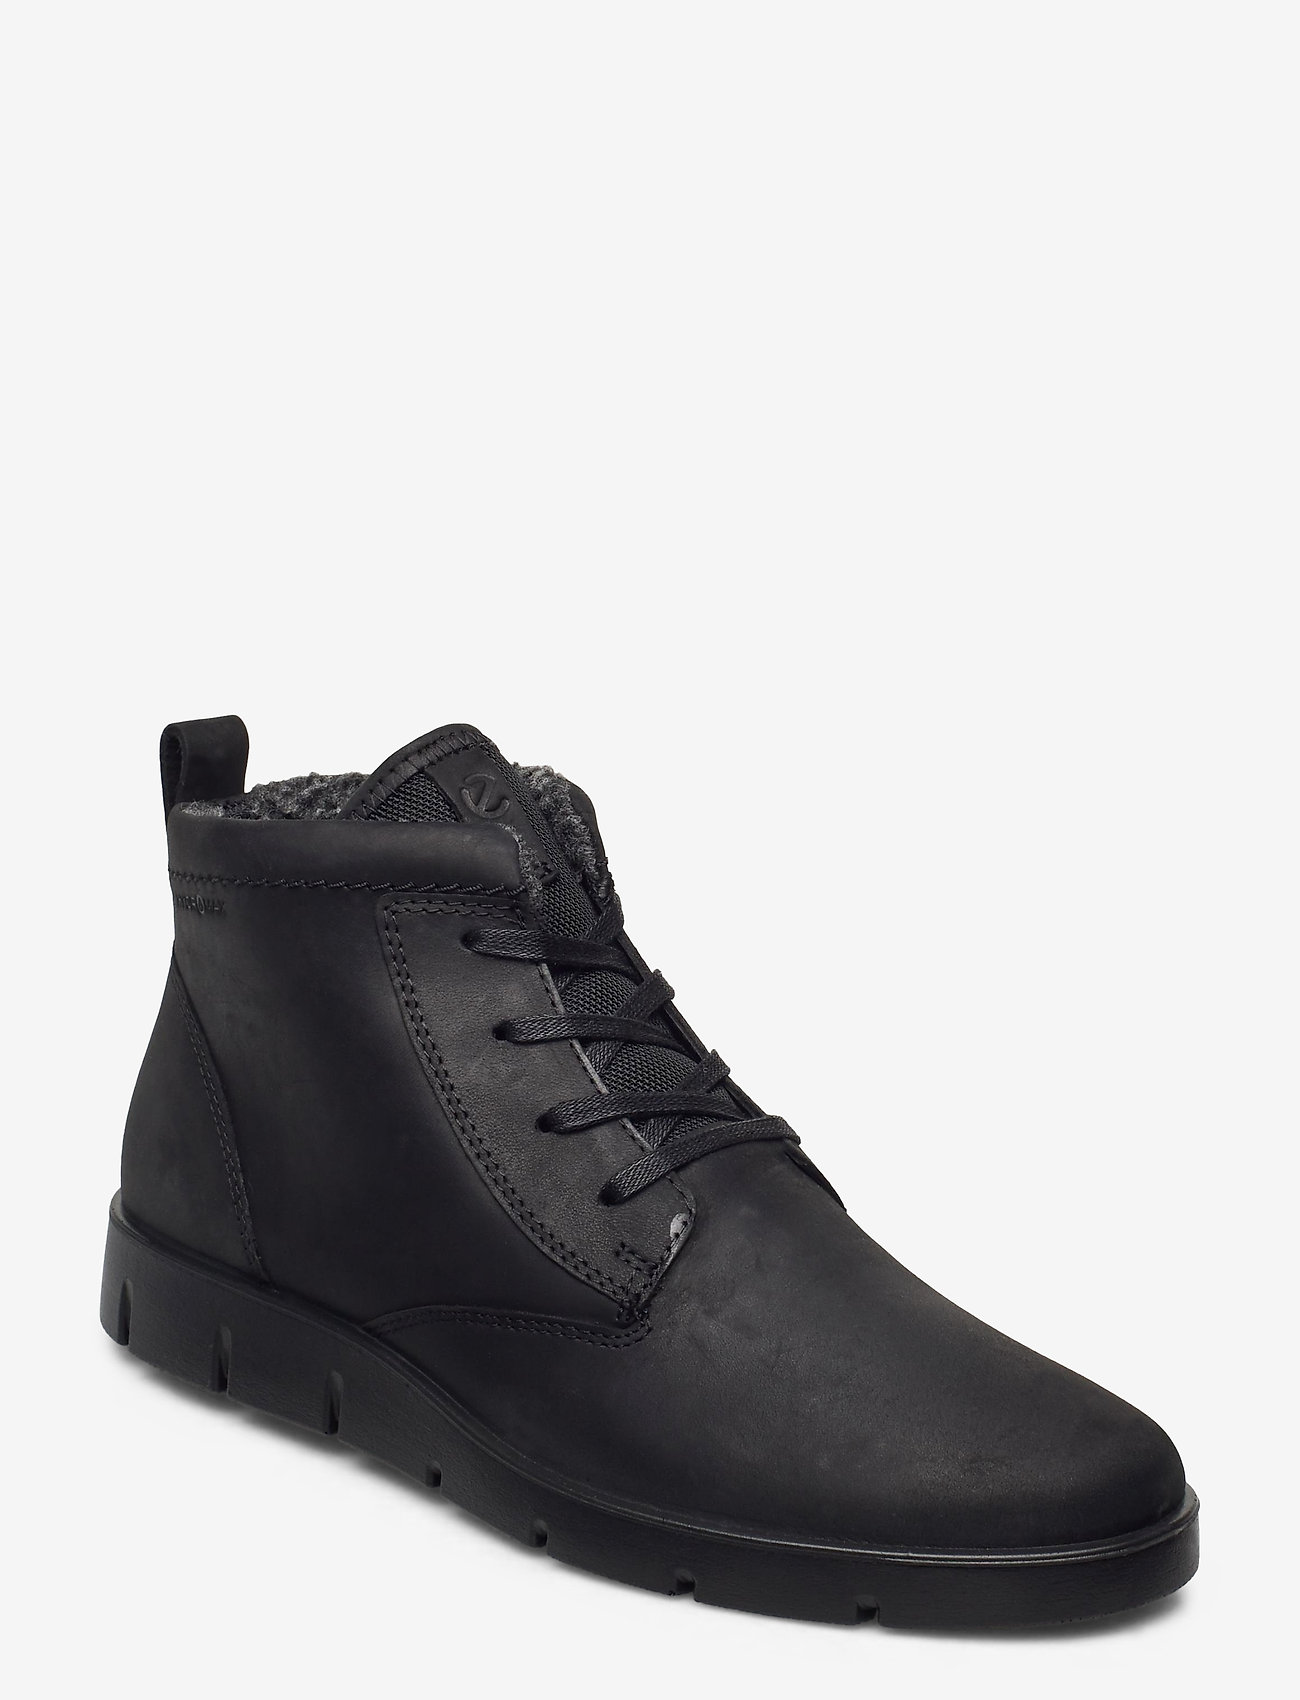 ECCO - BELLA - flat ankle boots - black - 0